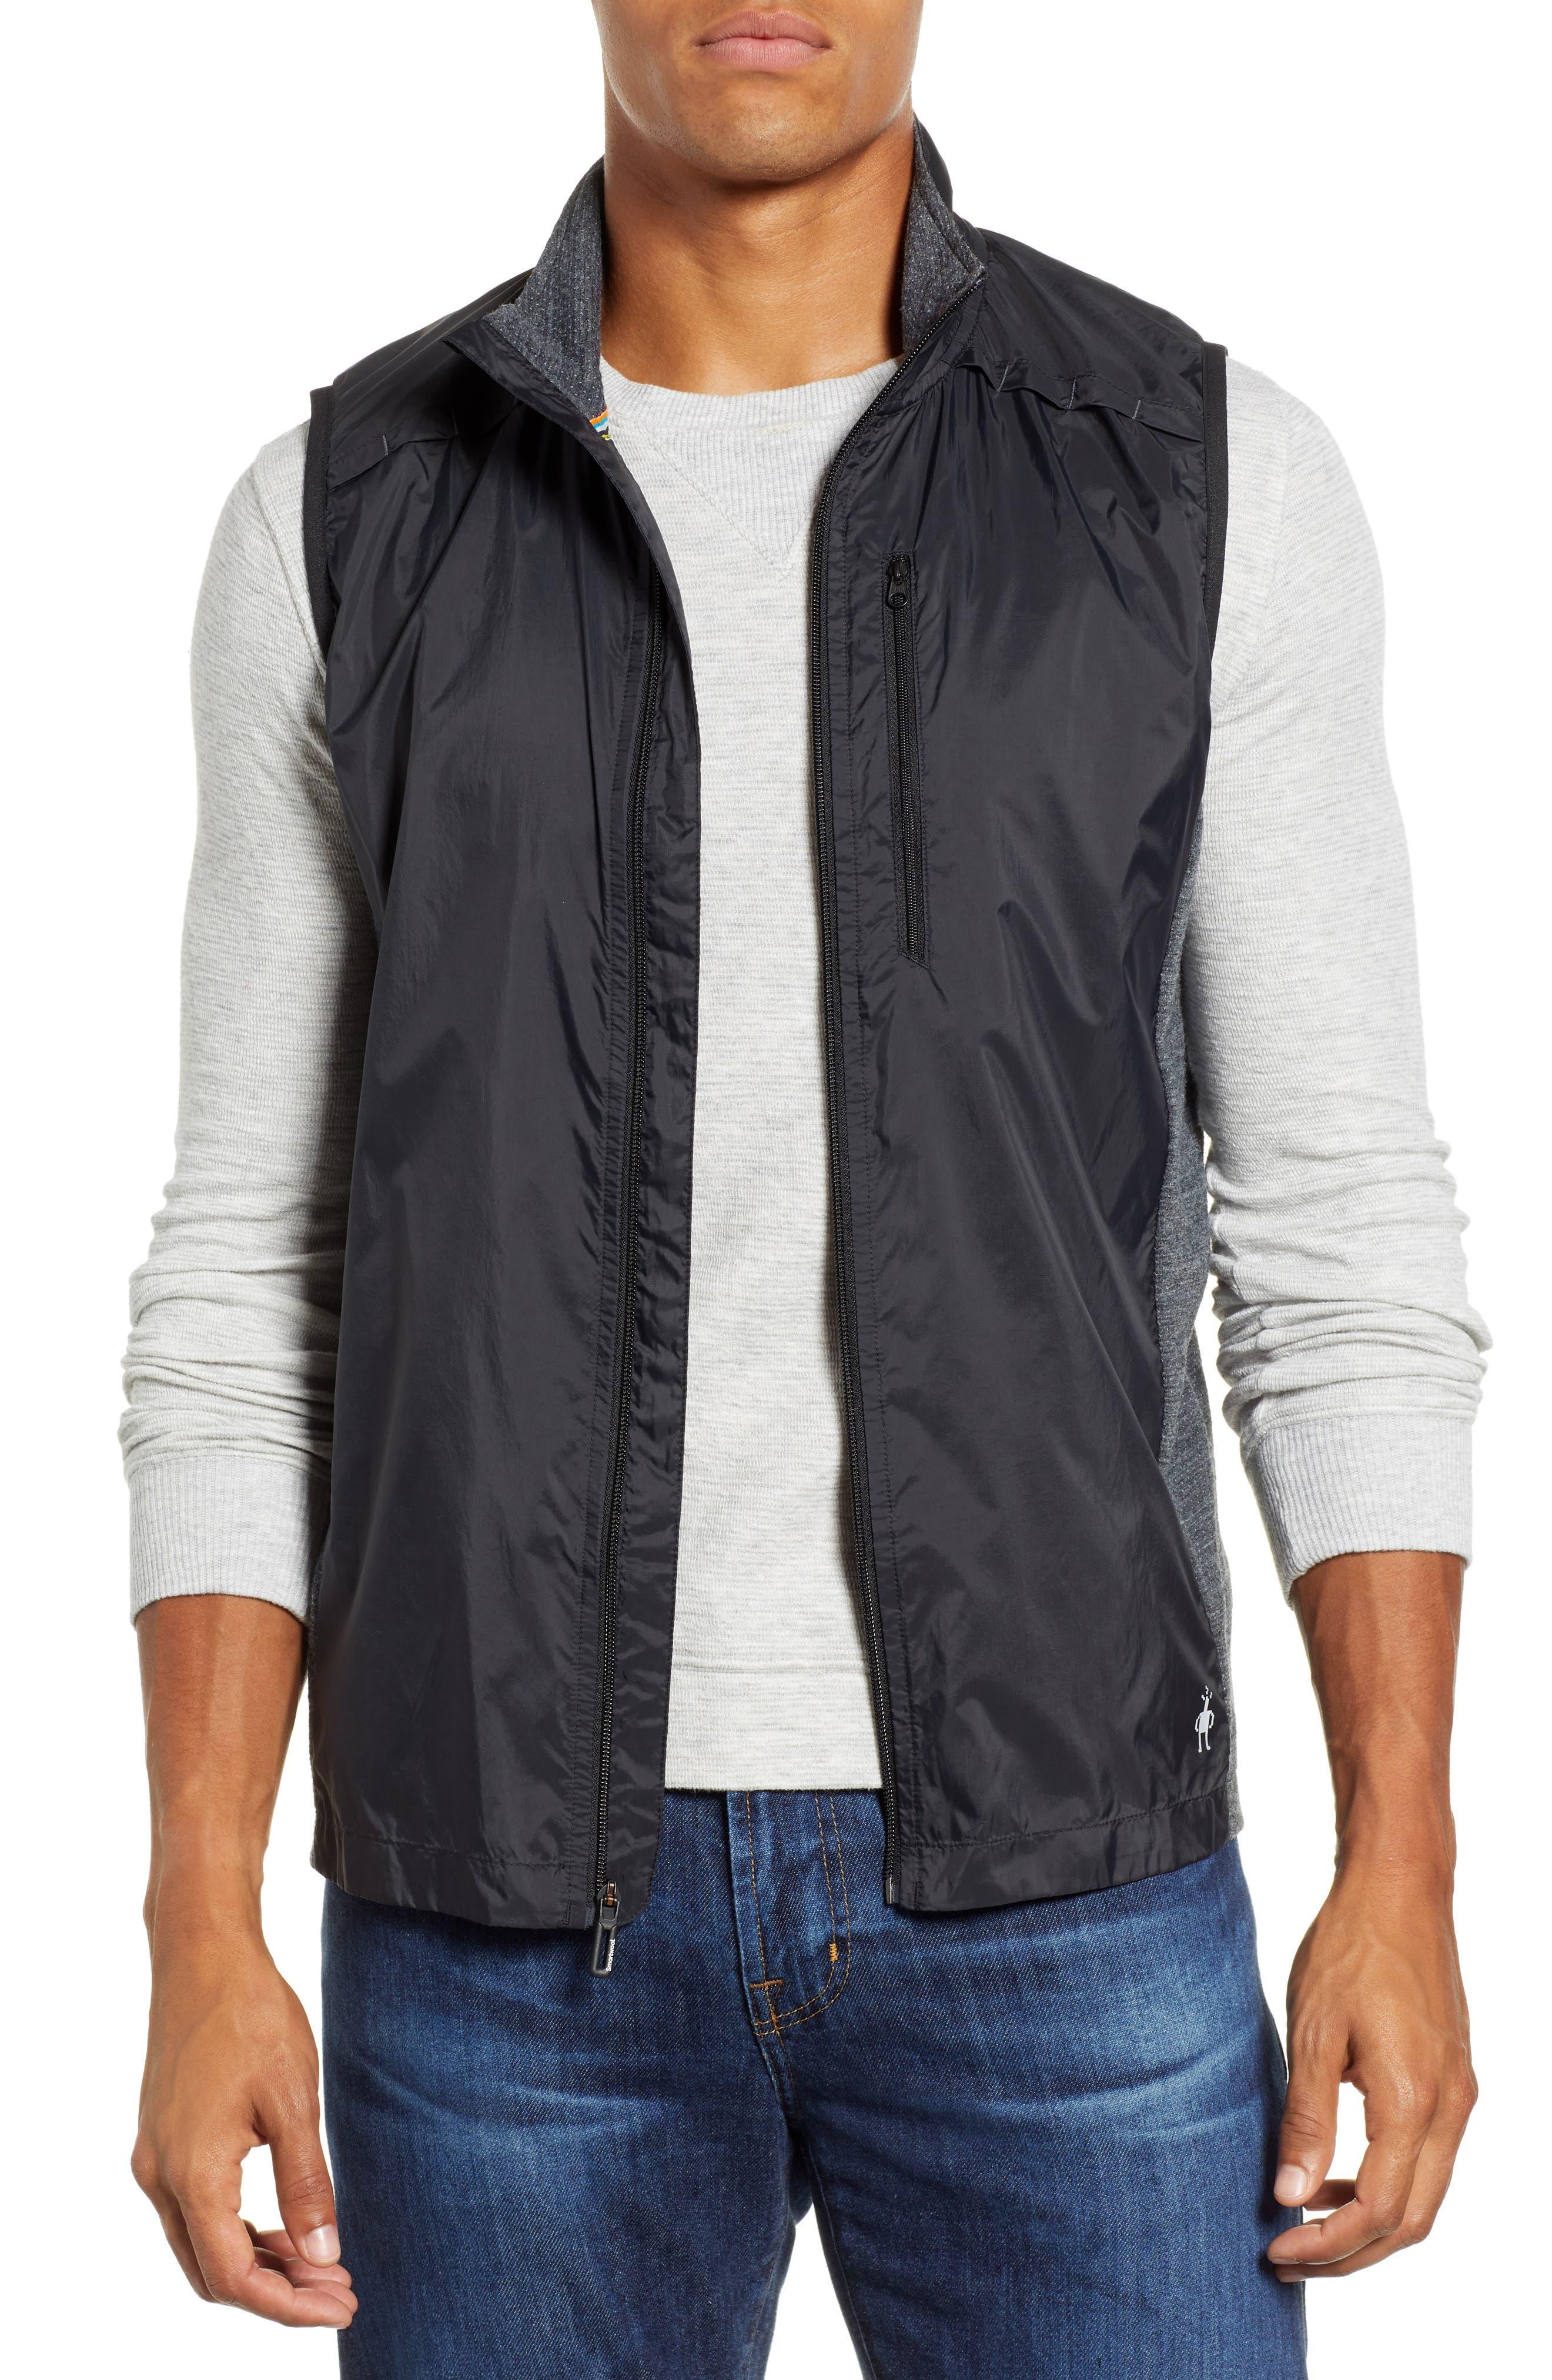 PhD<sup>®</sup> Ultra Light Sport Vest,                         Main,                         color, BLACK